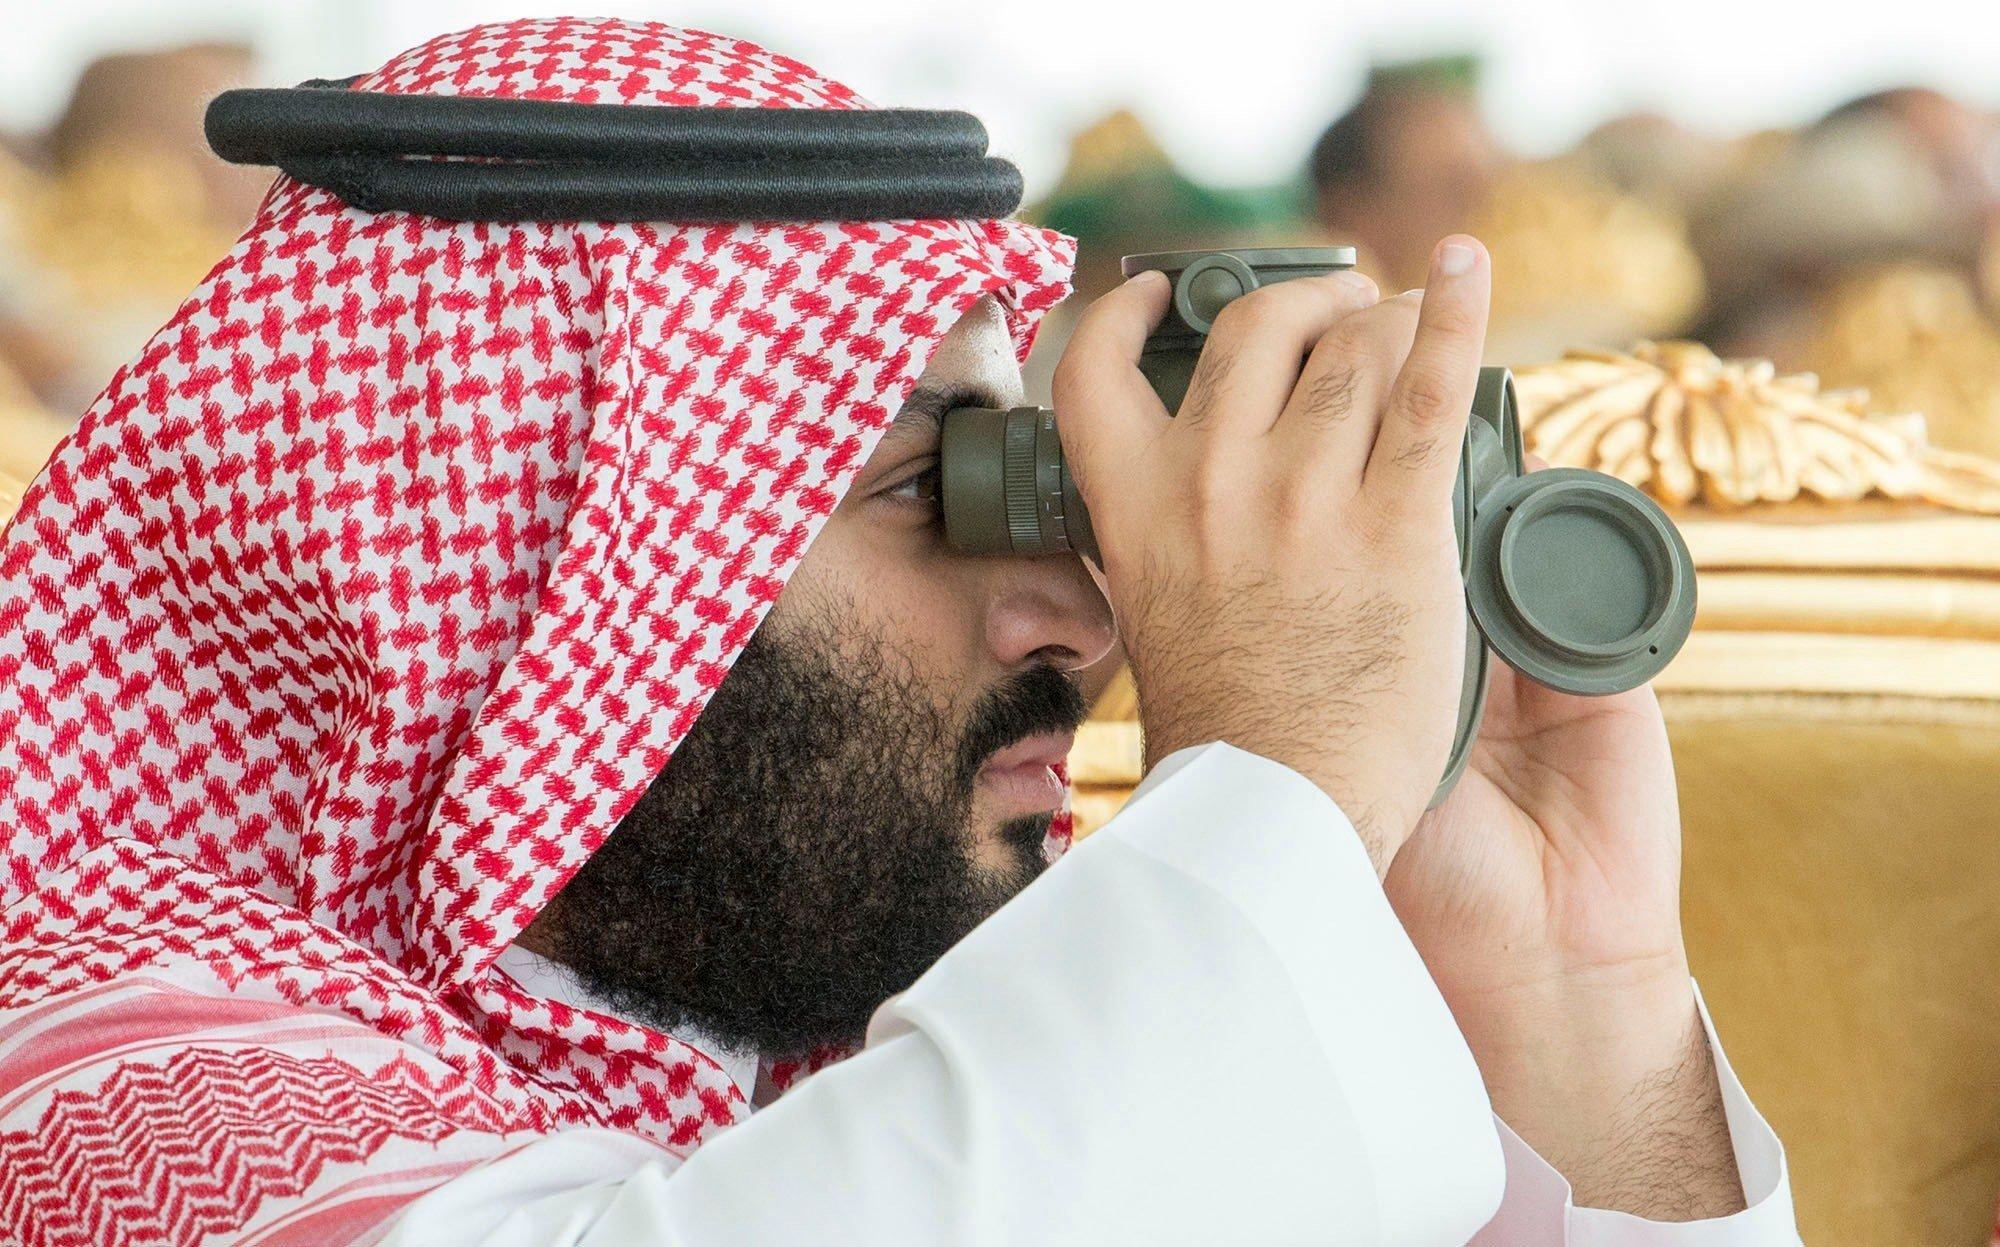 Bundesregierung genehmigt Waffenexporte an Golfstaaten